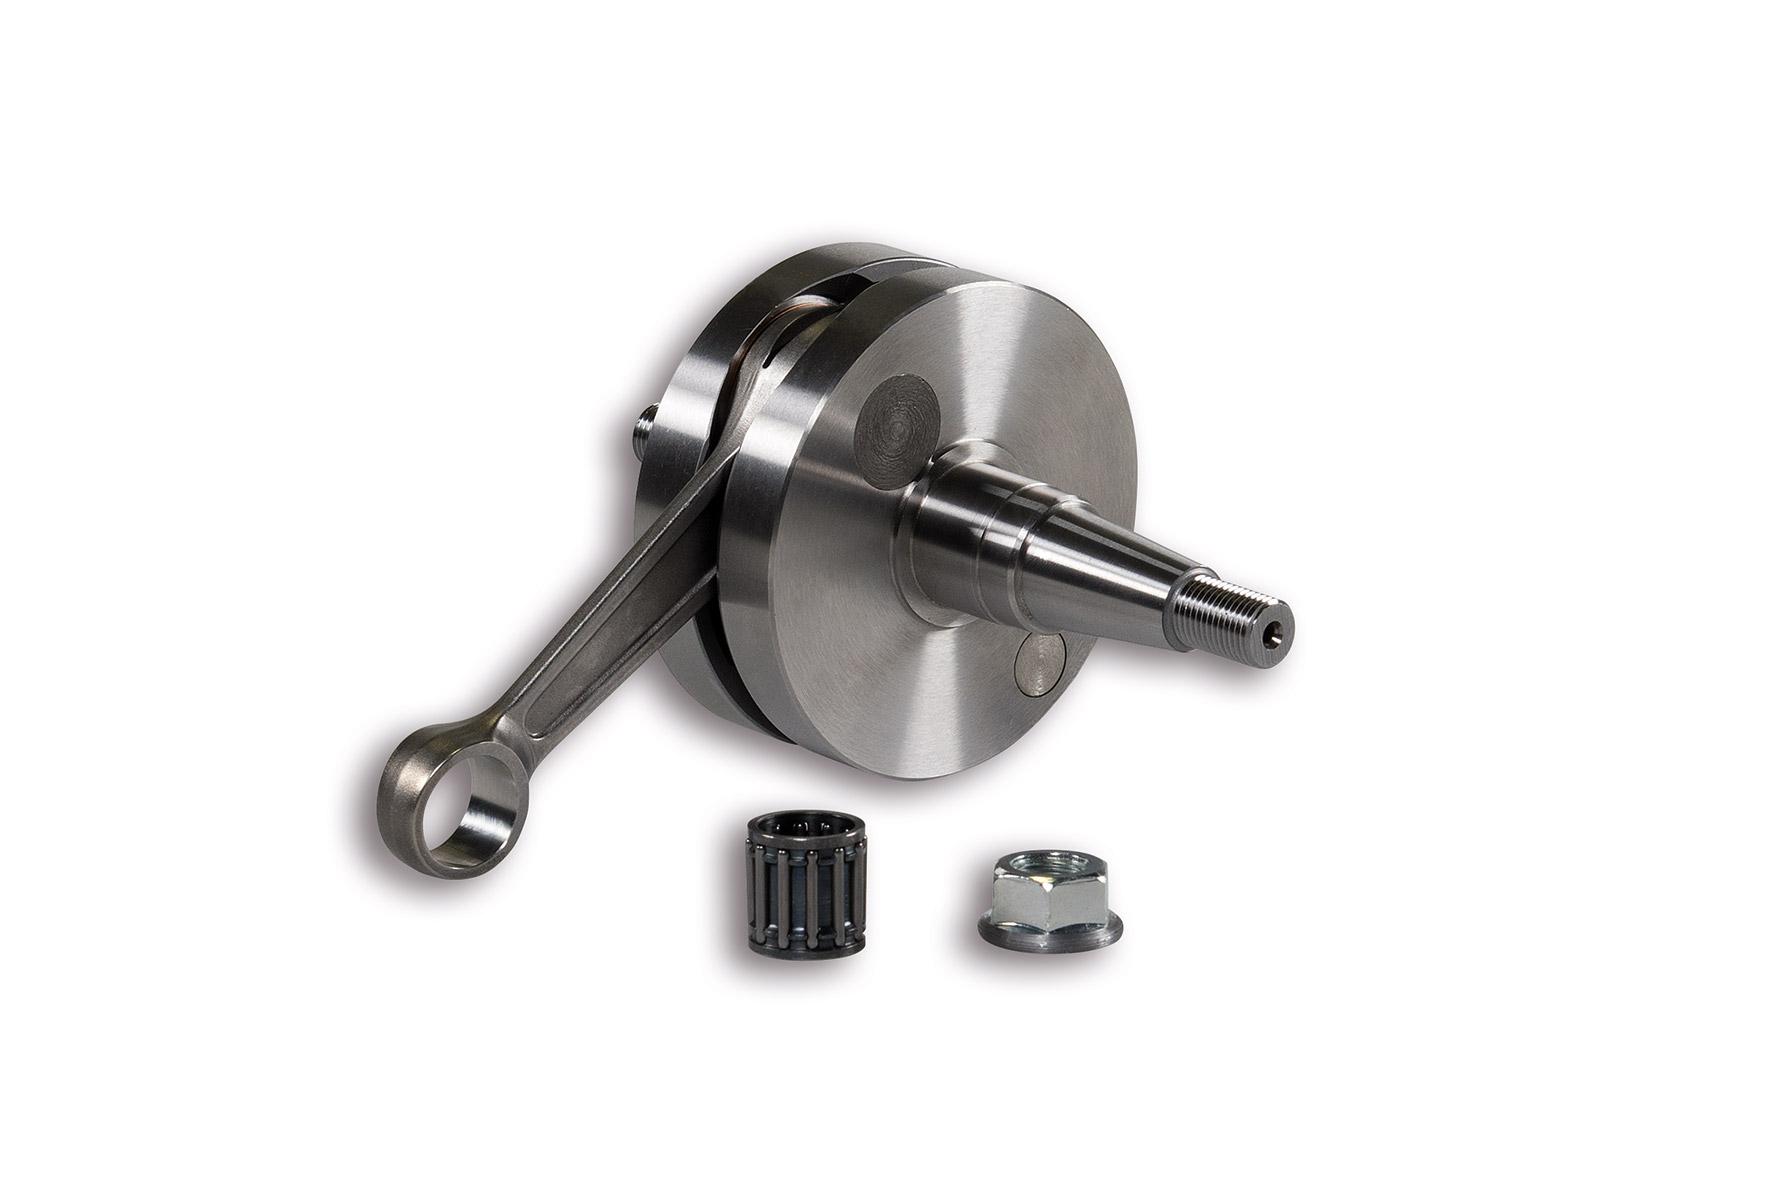 CRANKSHAFT pin Ø 15 rod 105 (stroke 51 mm) reed valve - cone Ø 20